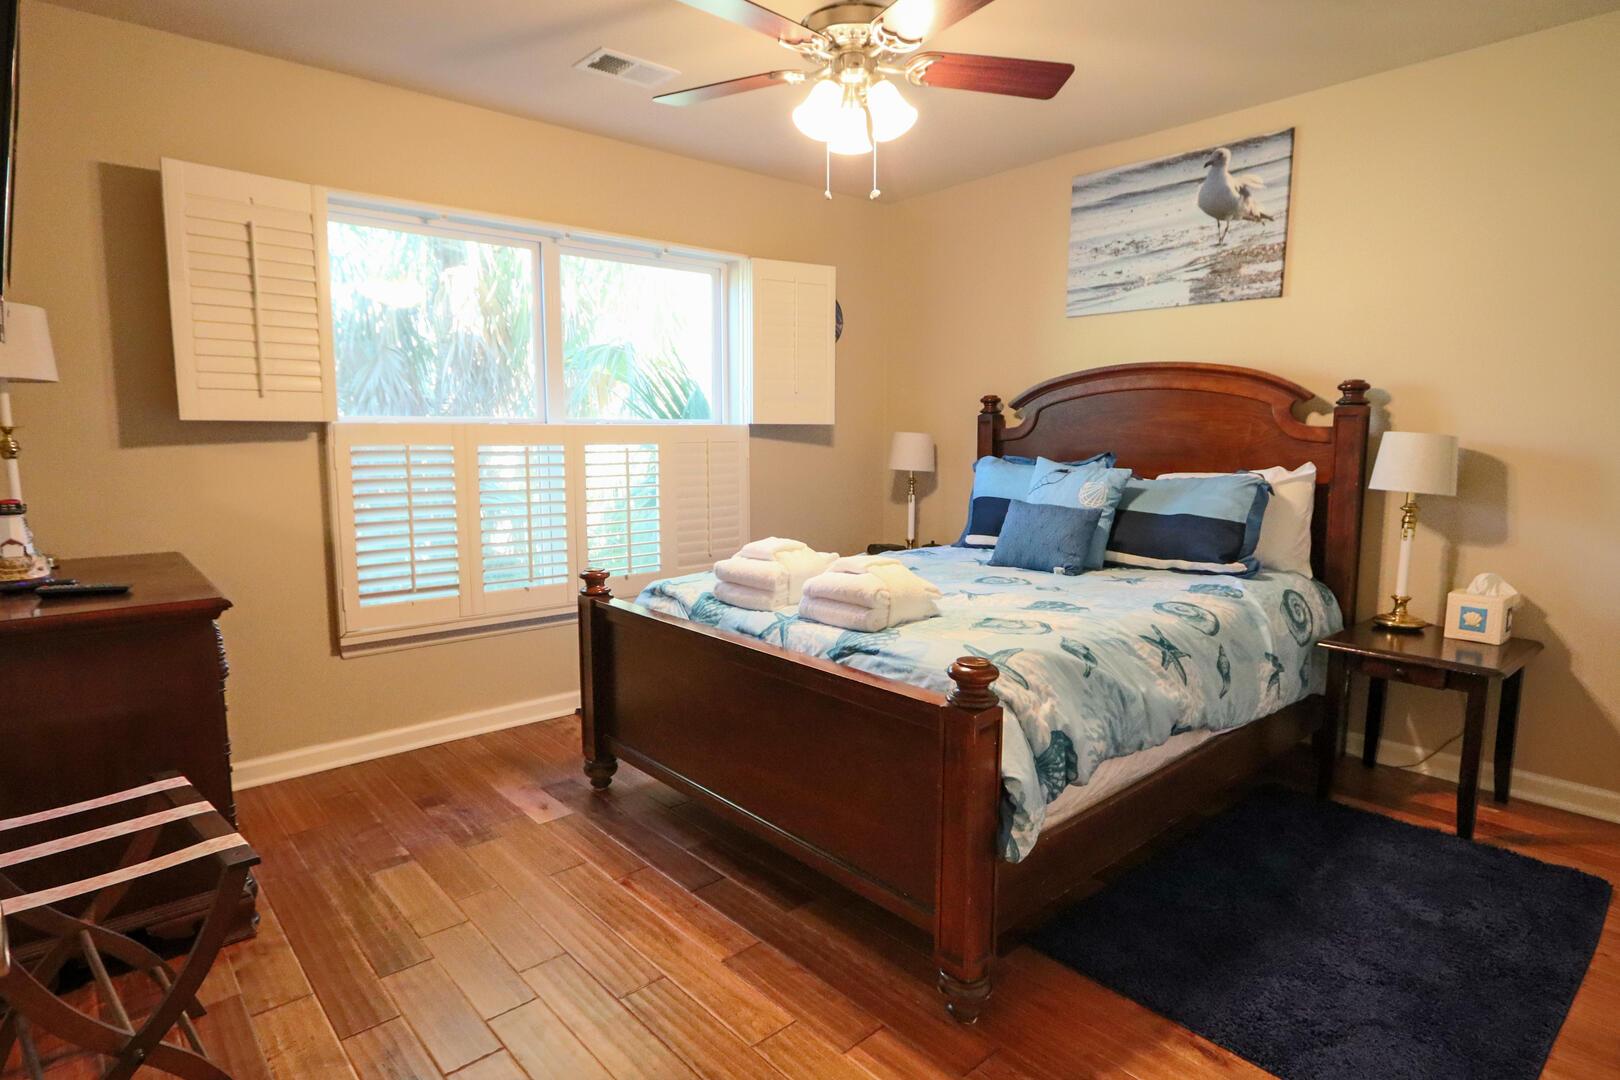 Bedroom 1, TV, jack and jill full bath